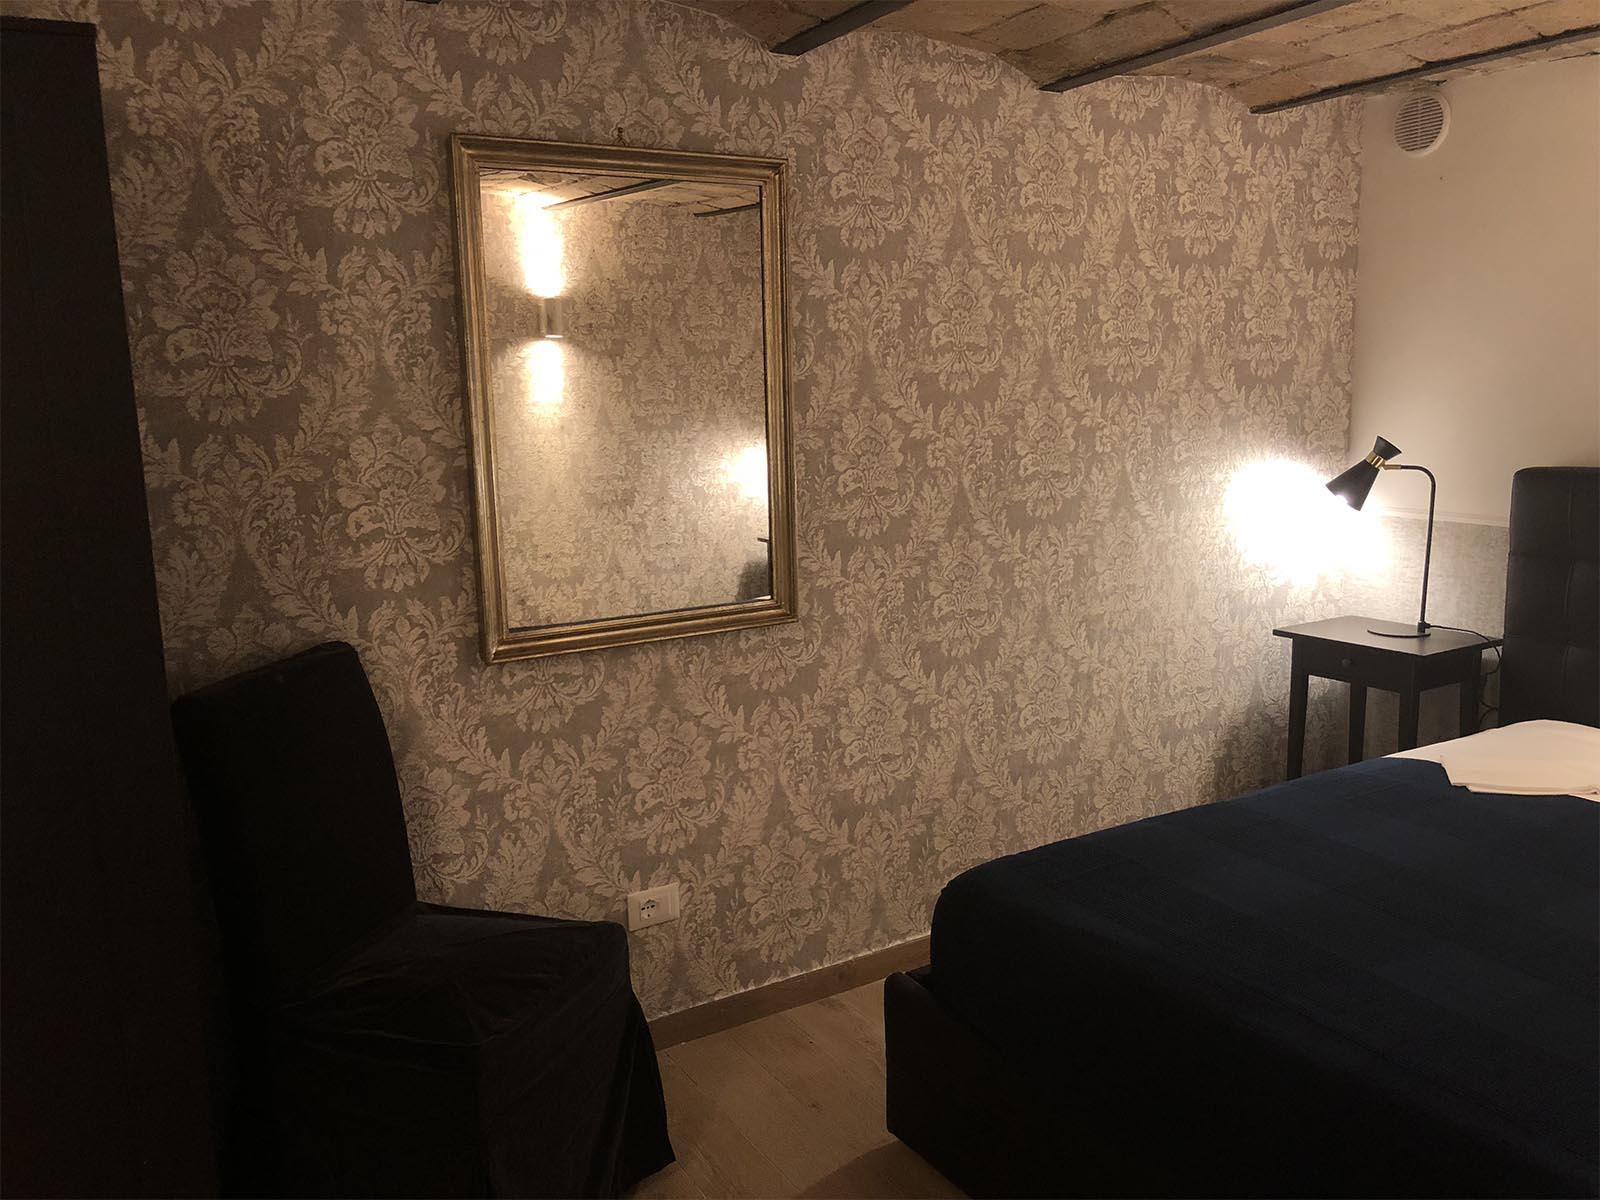 Giolitti Suite Interior 2